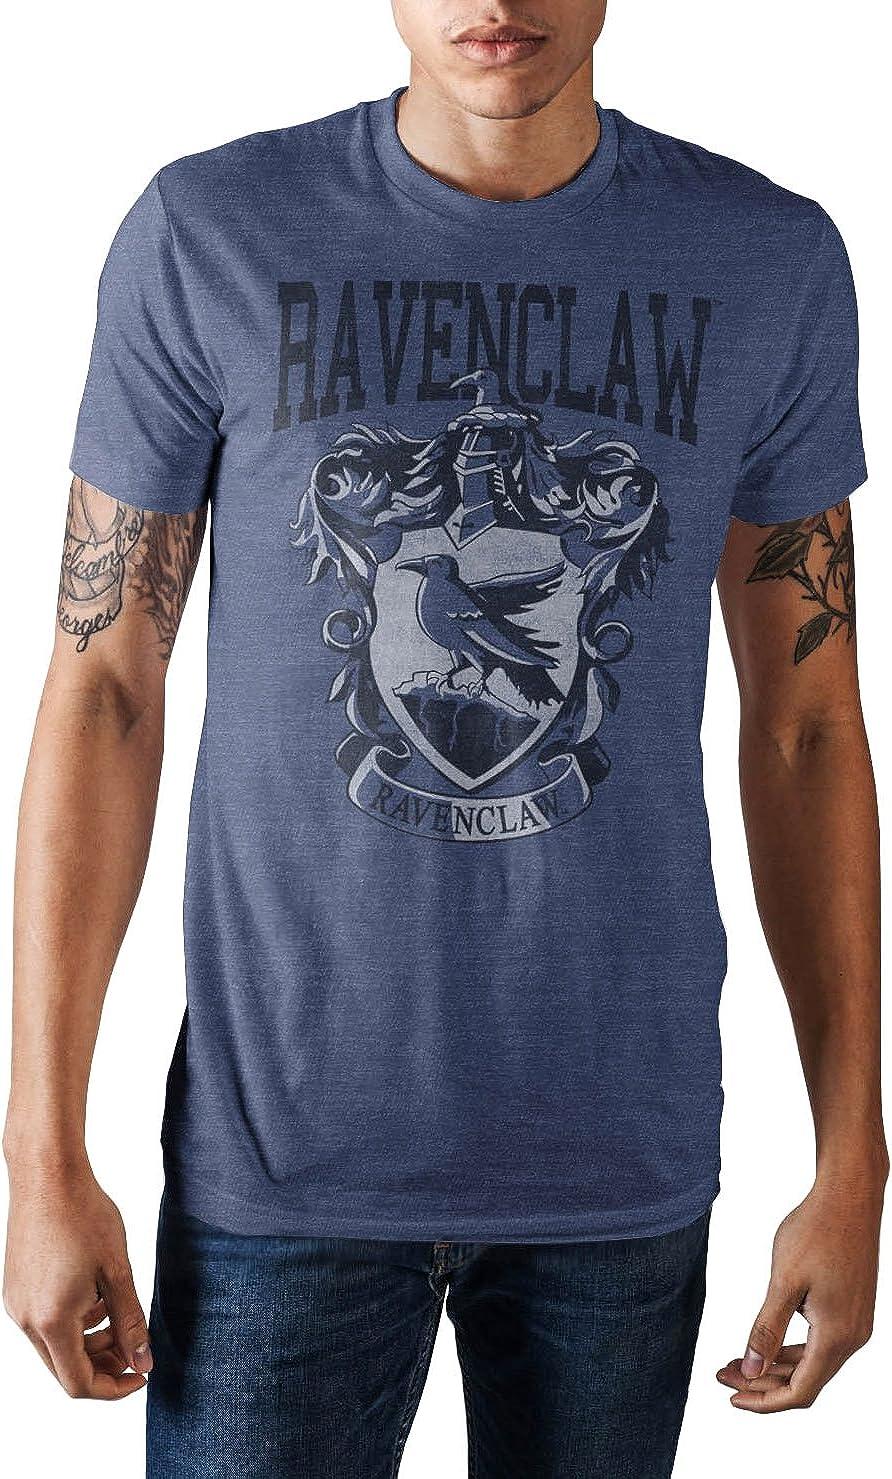 Harry Potter Hogwarts Ravenclaw House Crest Men's T-shirt